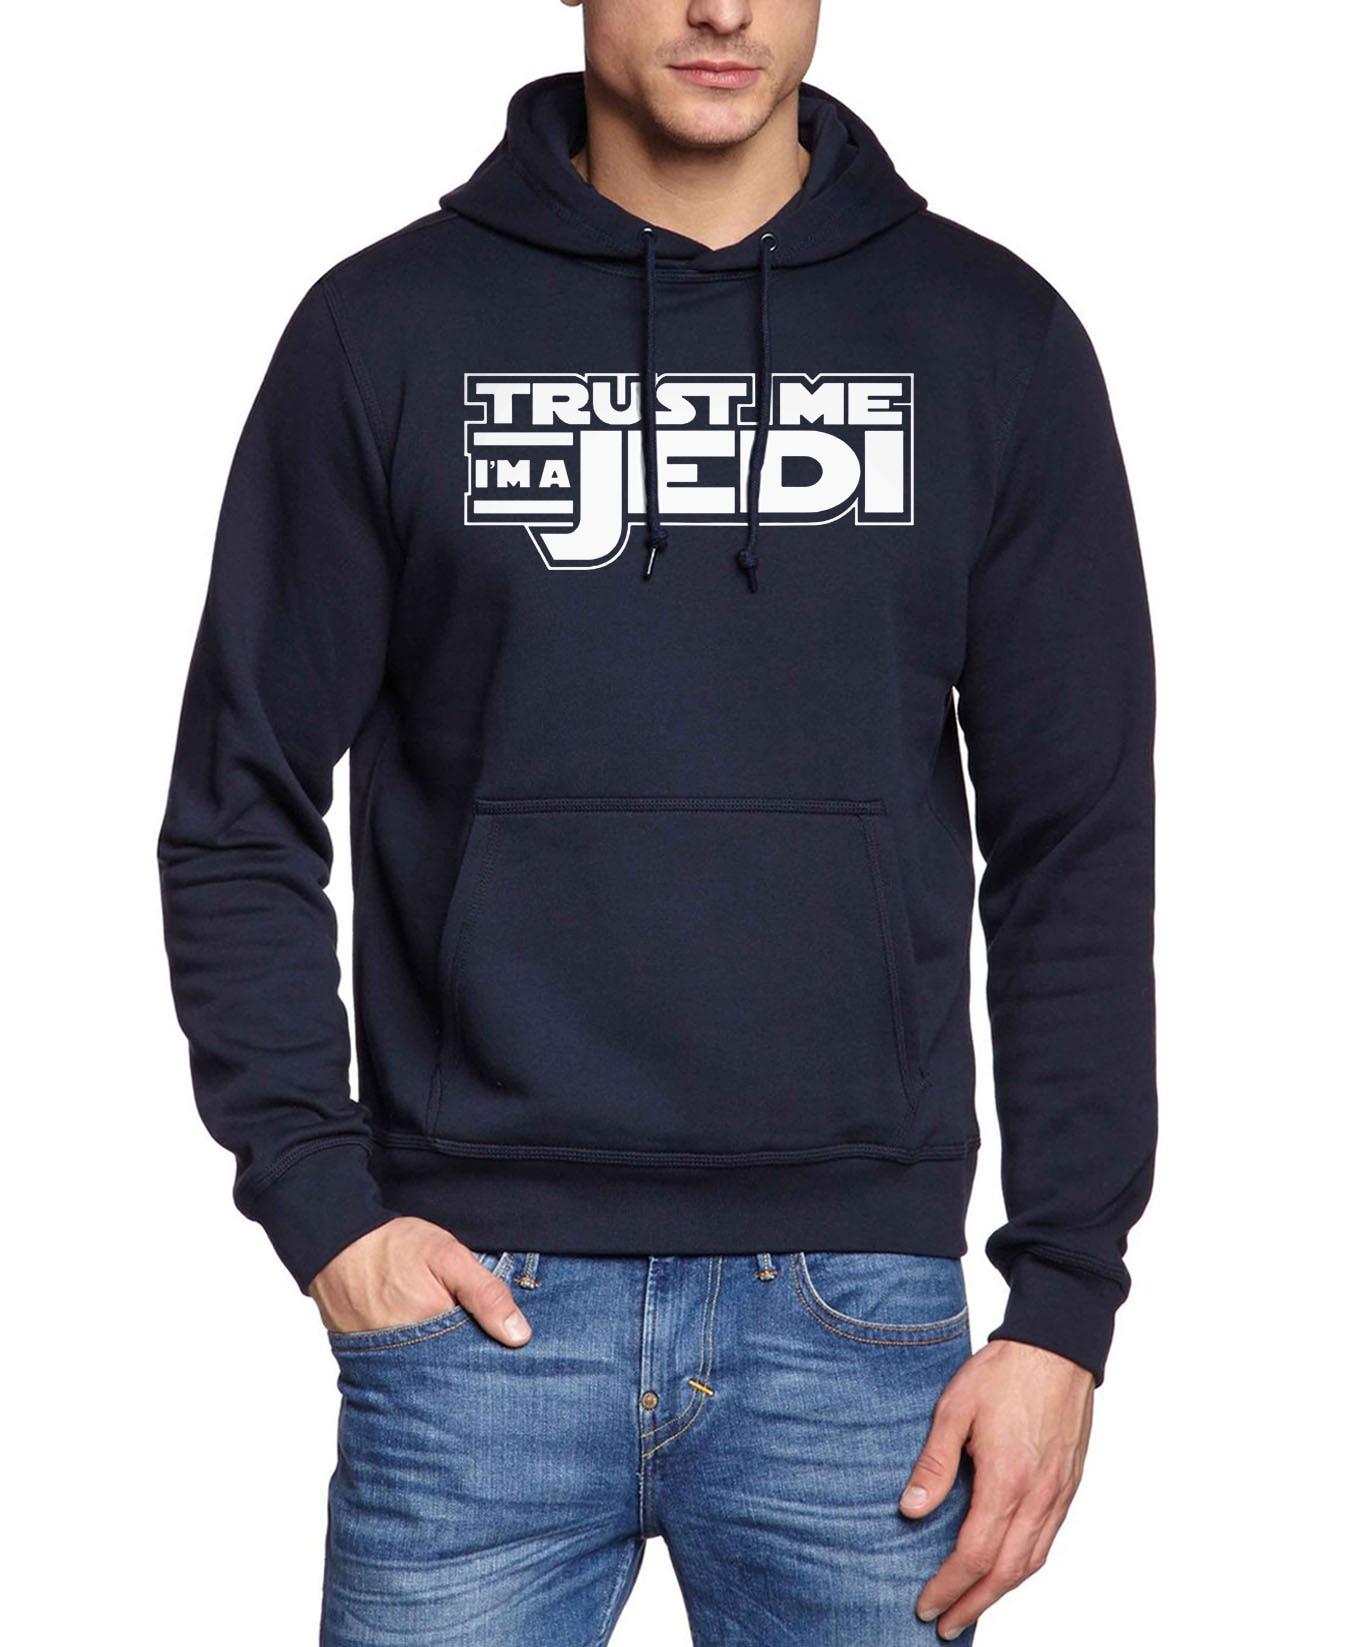 Fashion  star wars hip hop Men hoodies harajuku I'm a  printed harajuku streetwear brand tracksuit male kpop fleece sweatshirt